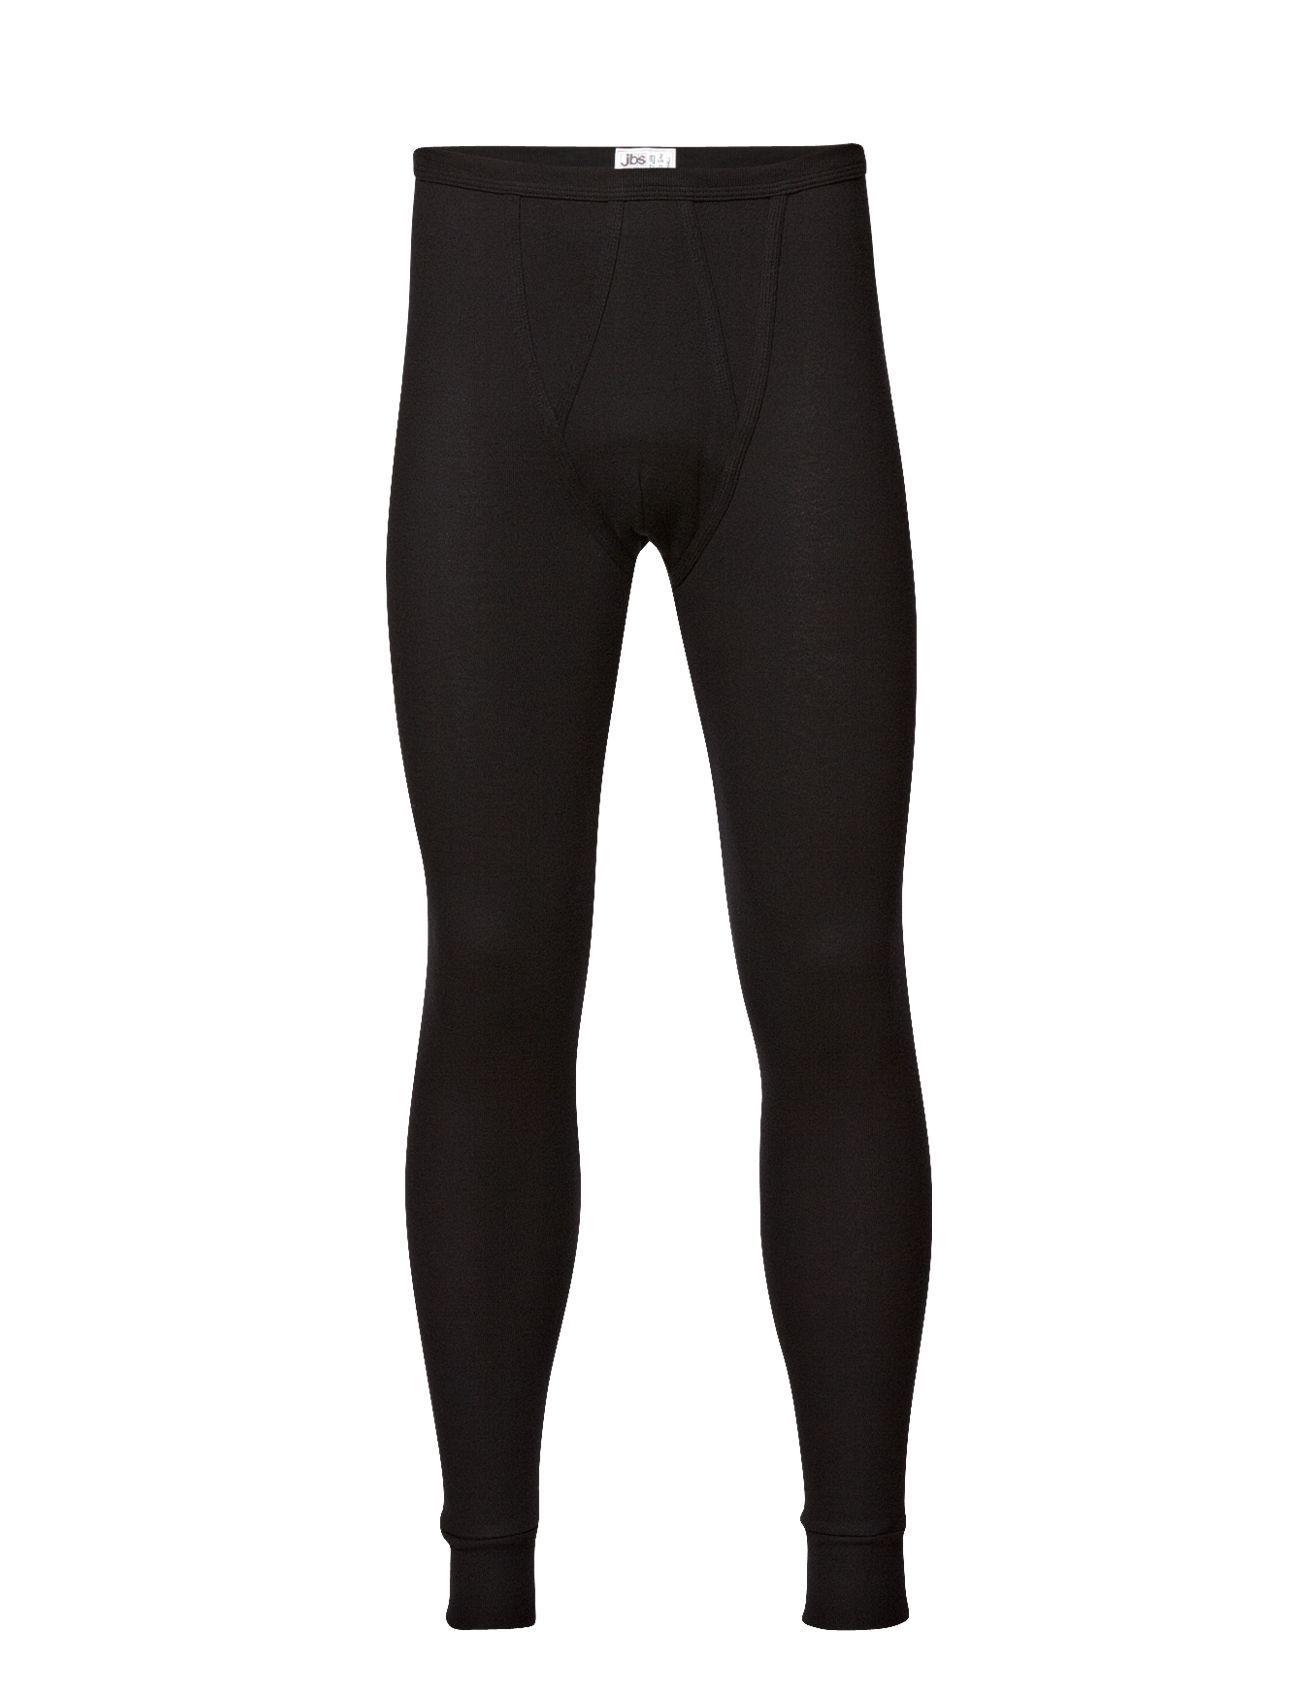 Original Long Legs JBS Lange underbukser til Herrer i hvid